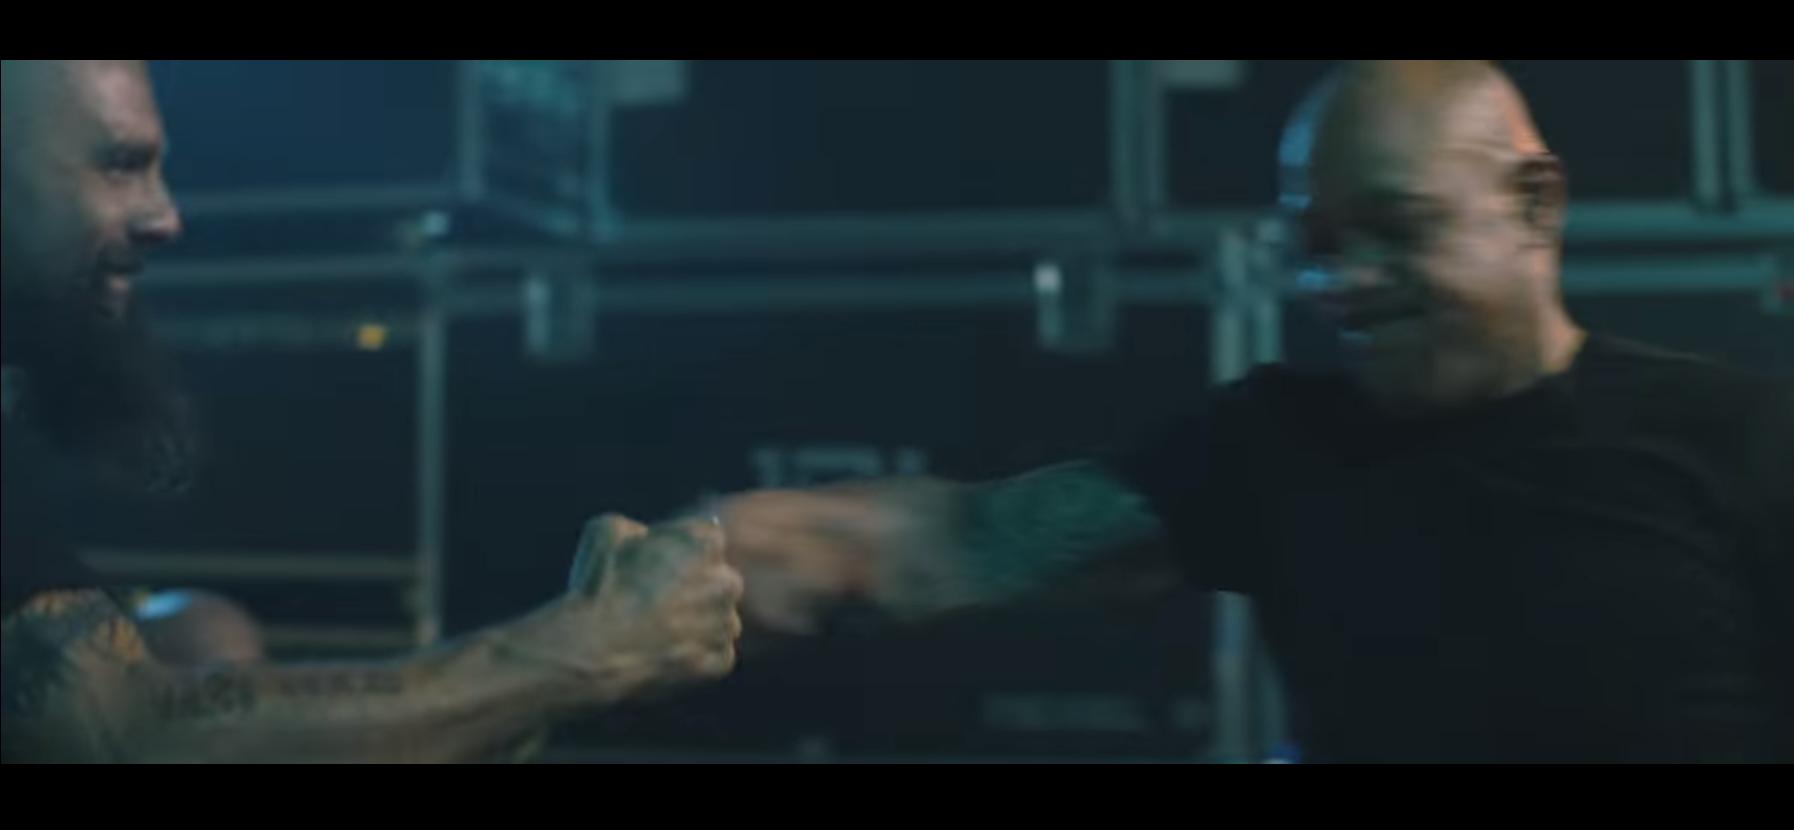 fistbump